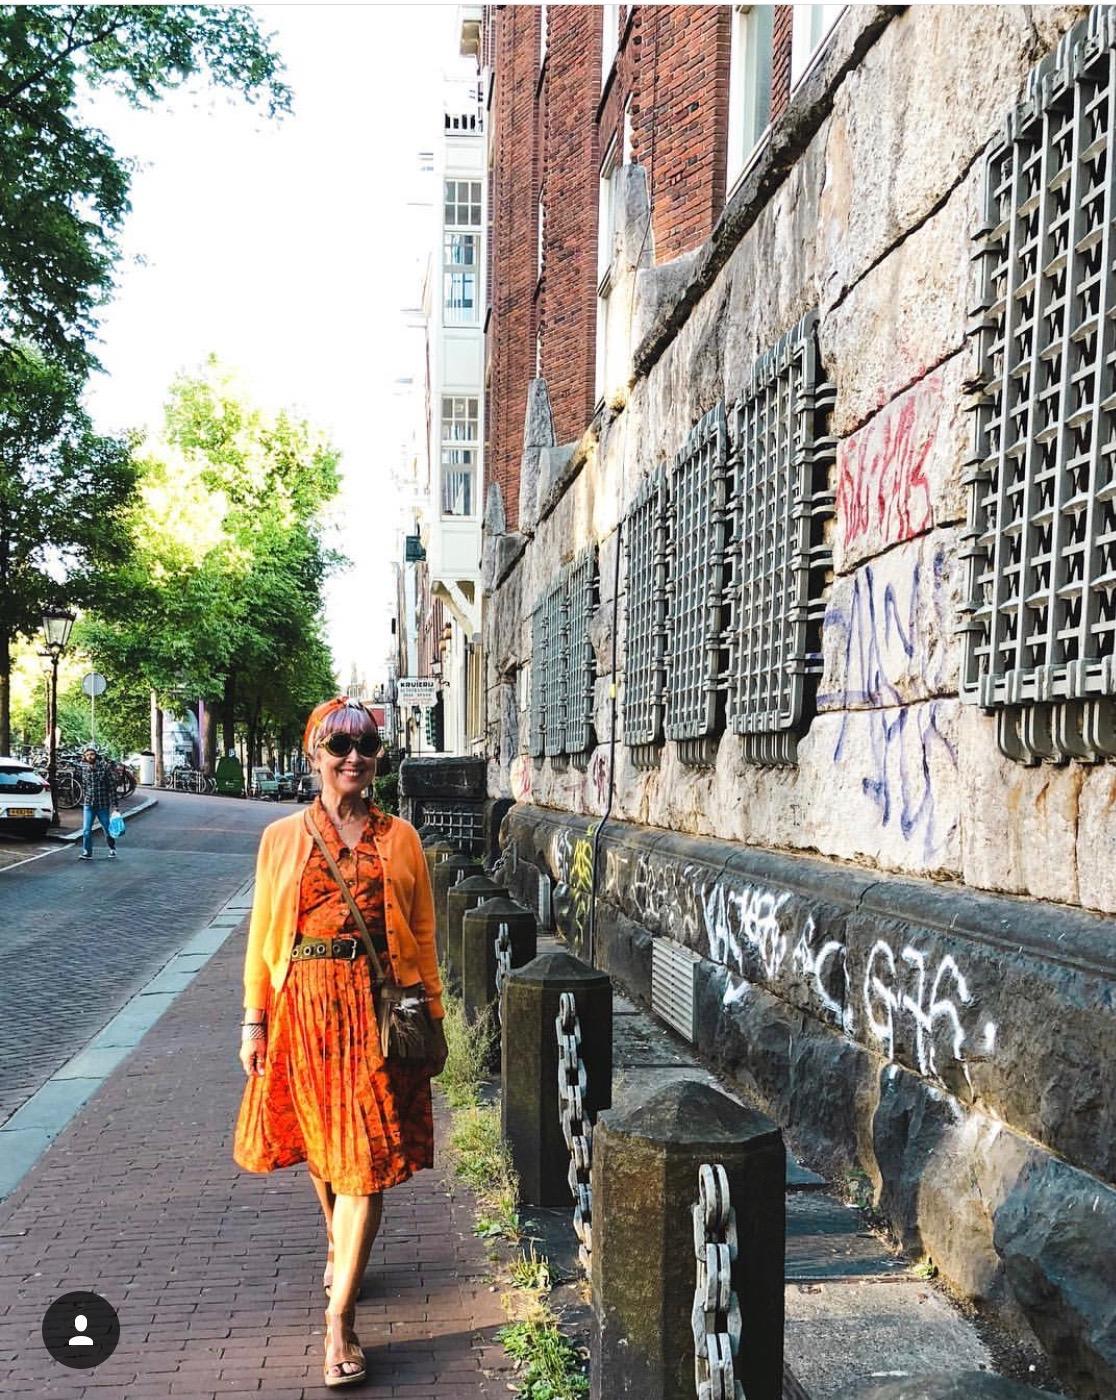 Amsterdam dressed in orange